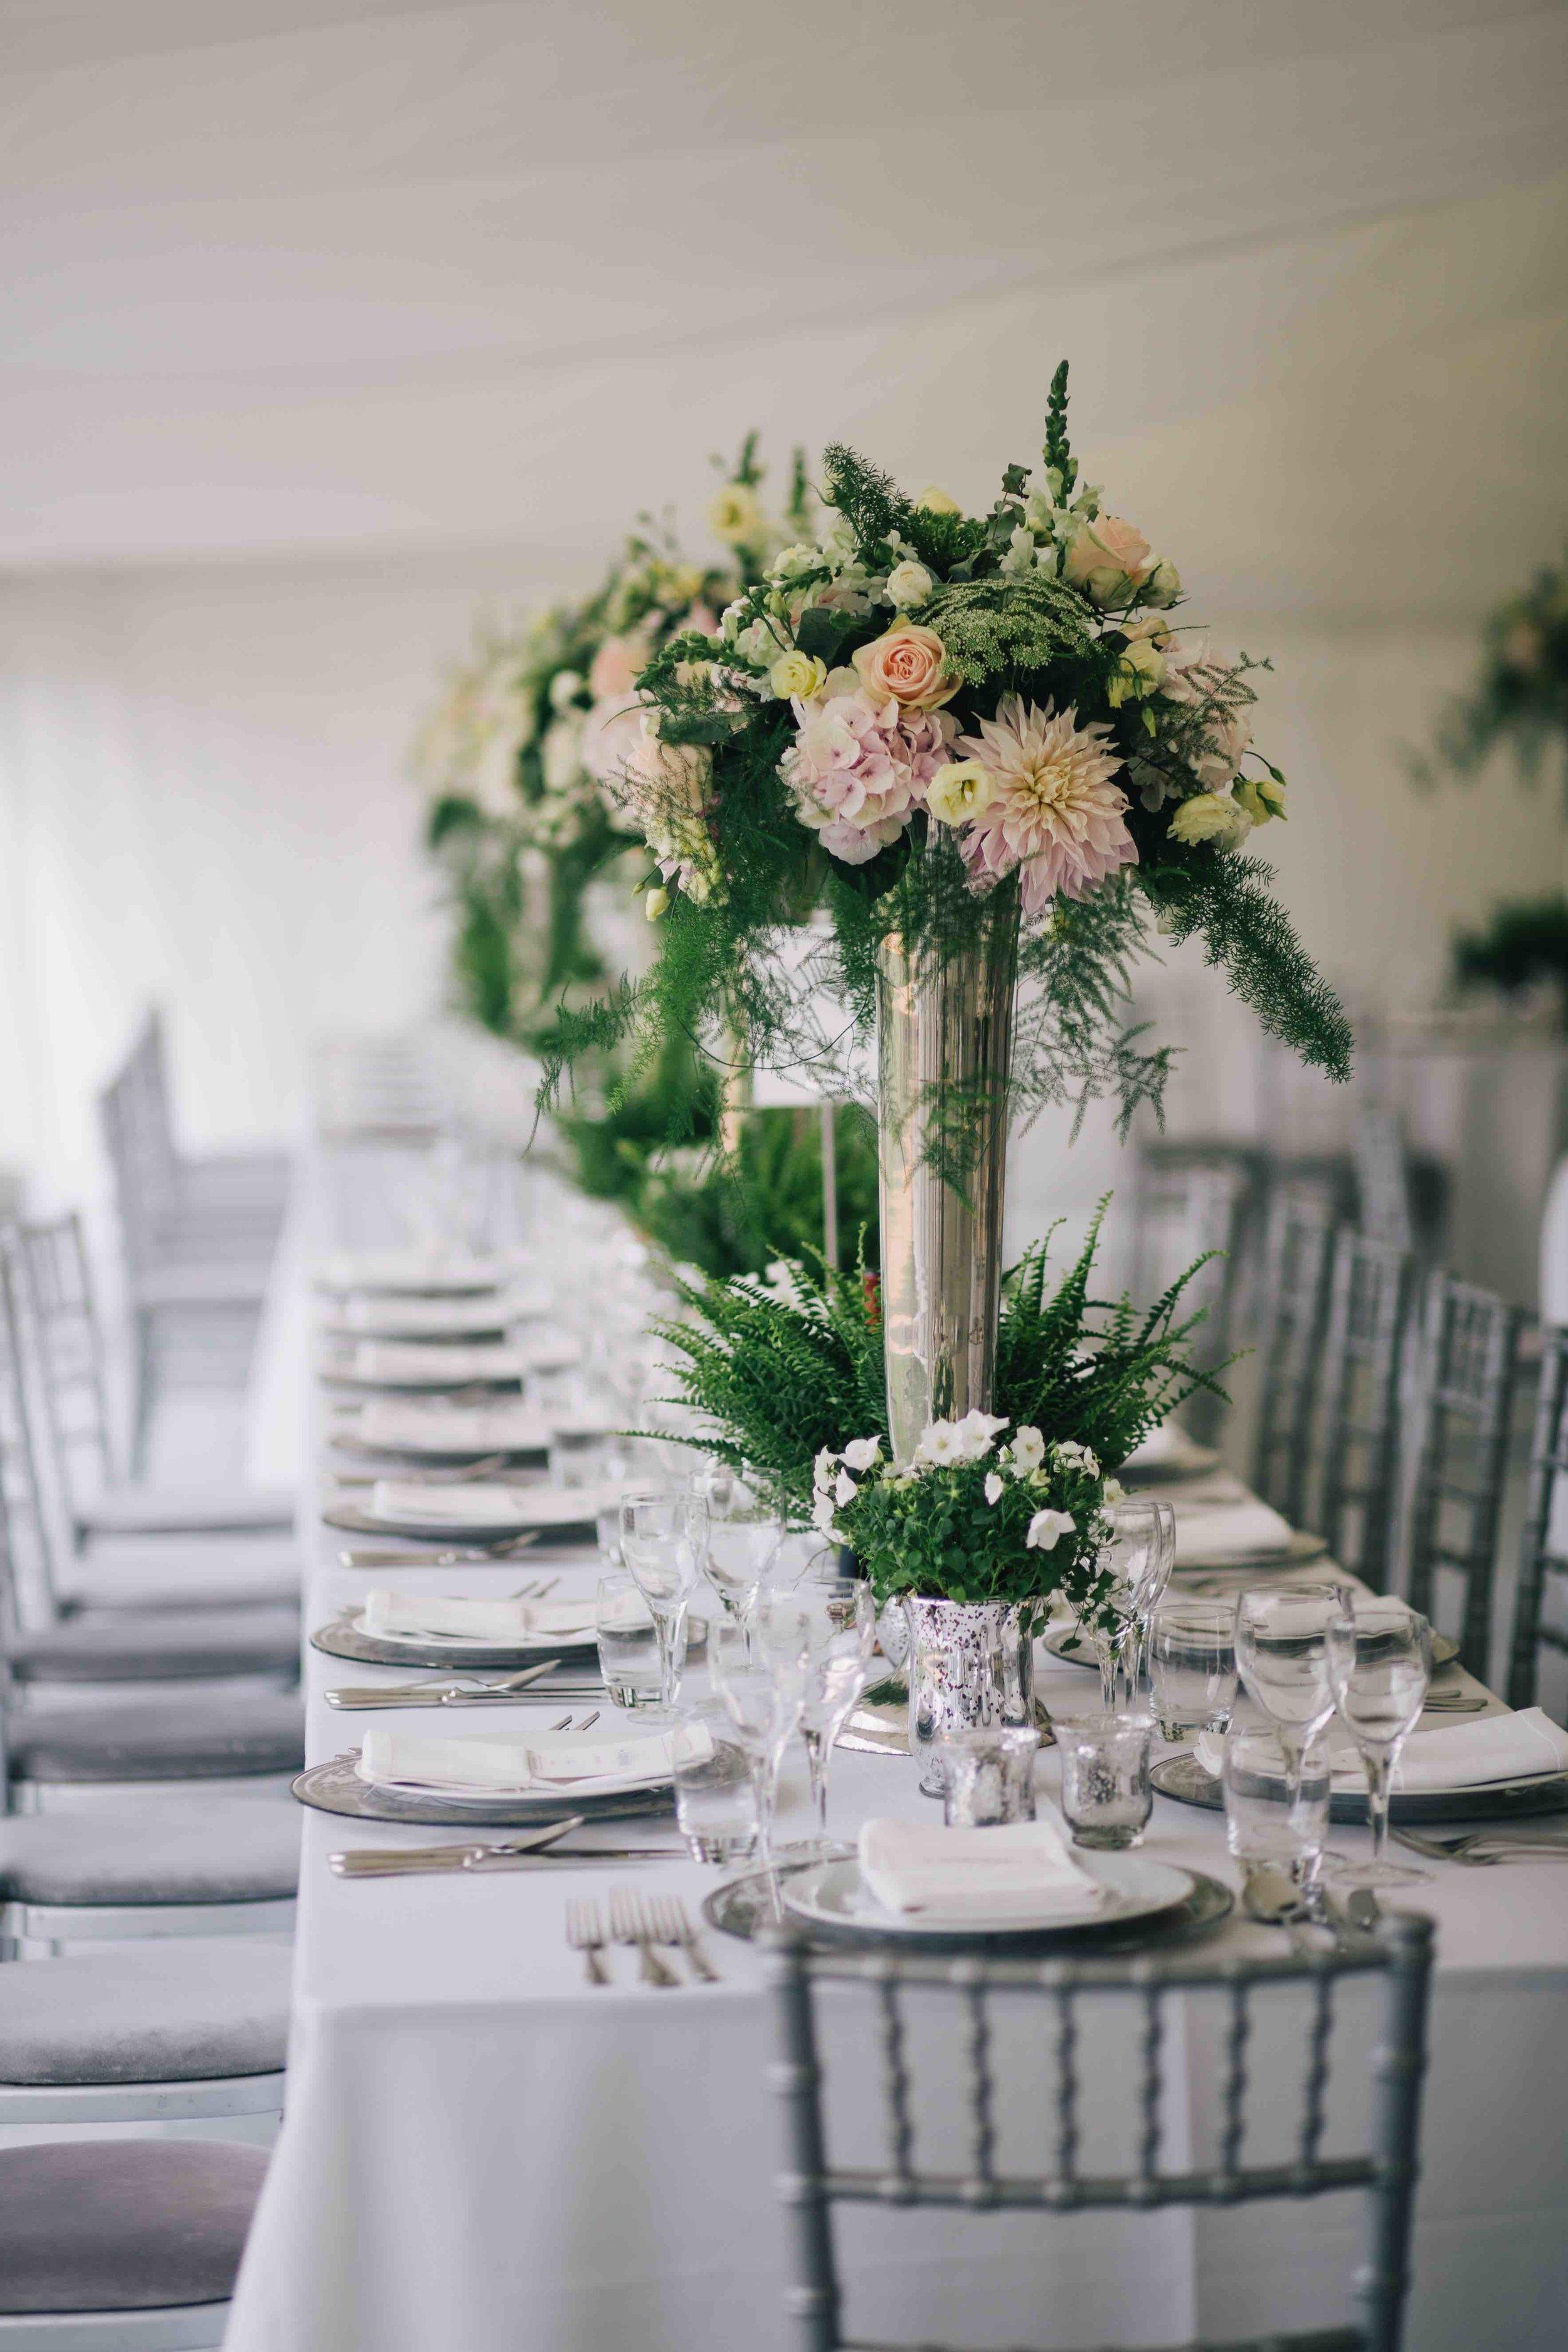 Littleton-Rose-Botanical-Wedding-Cornwall-Wedding-Planners-Table-Centres.jpg